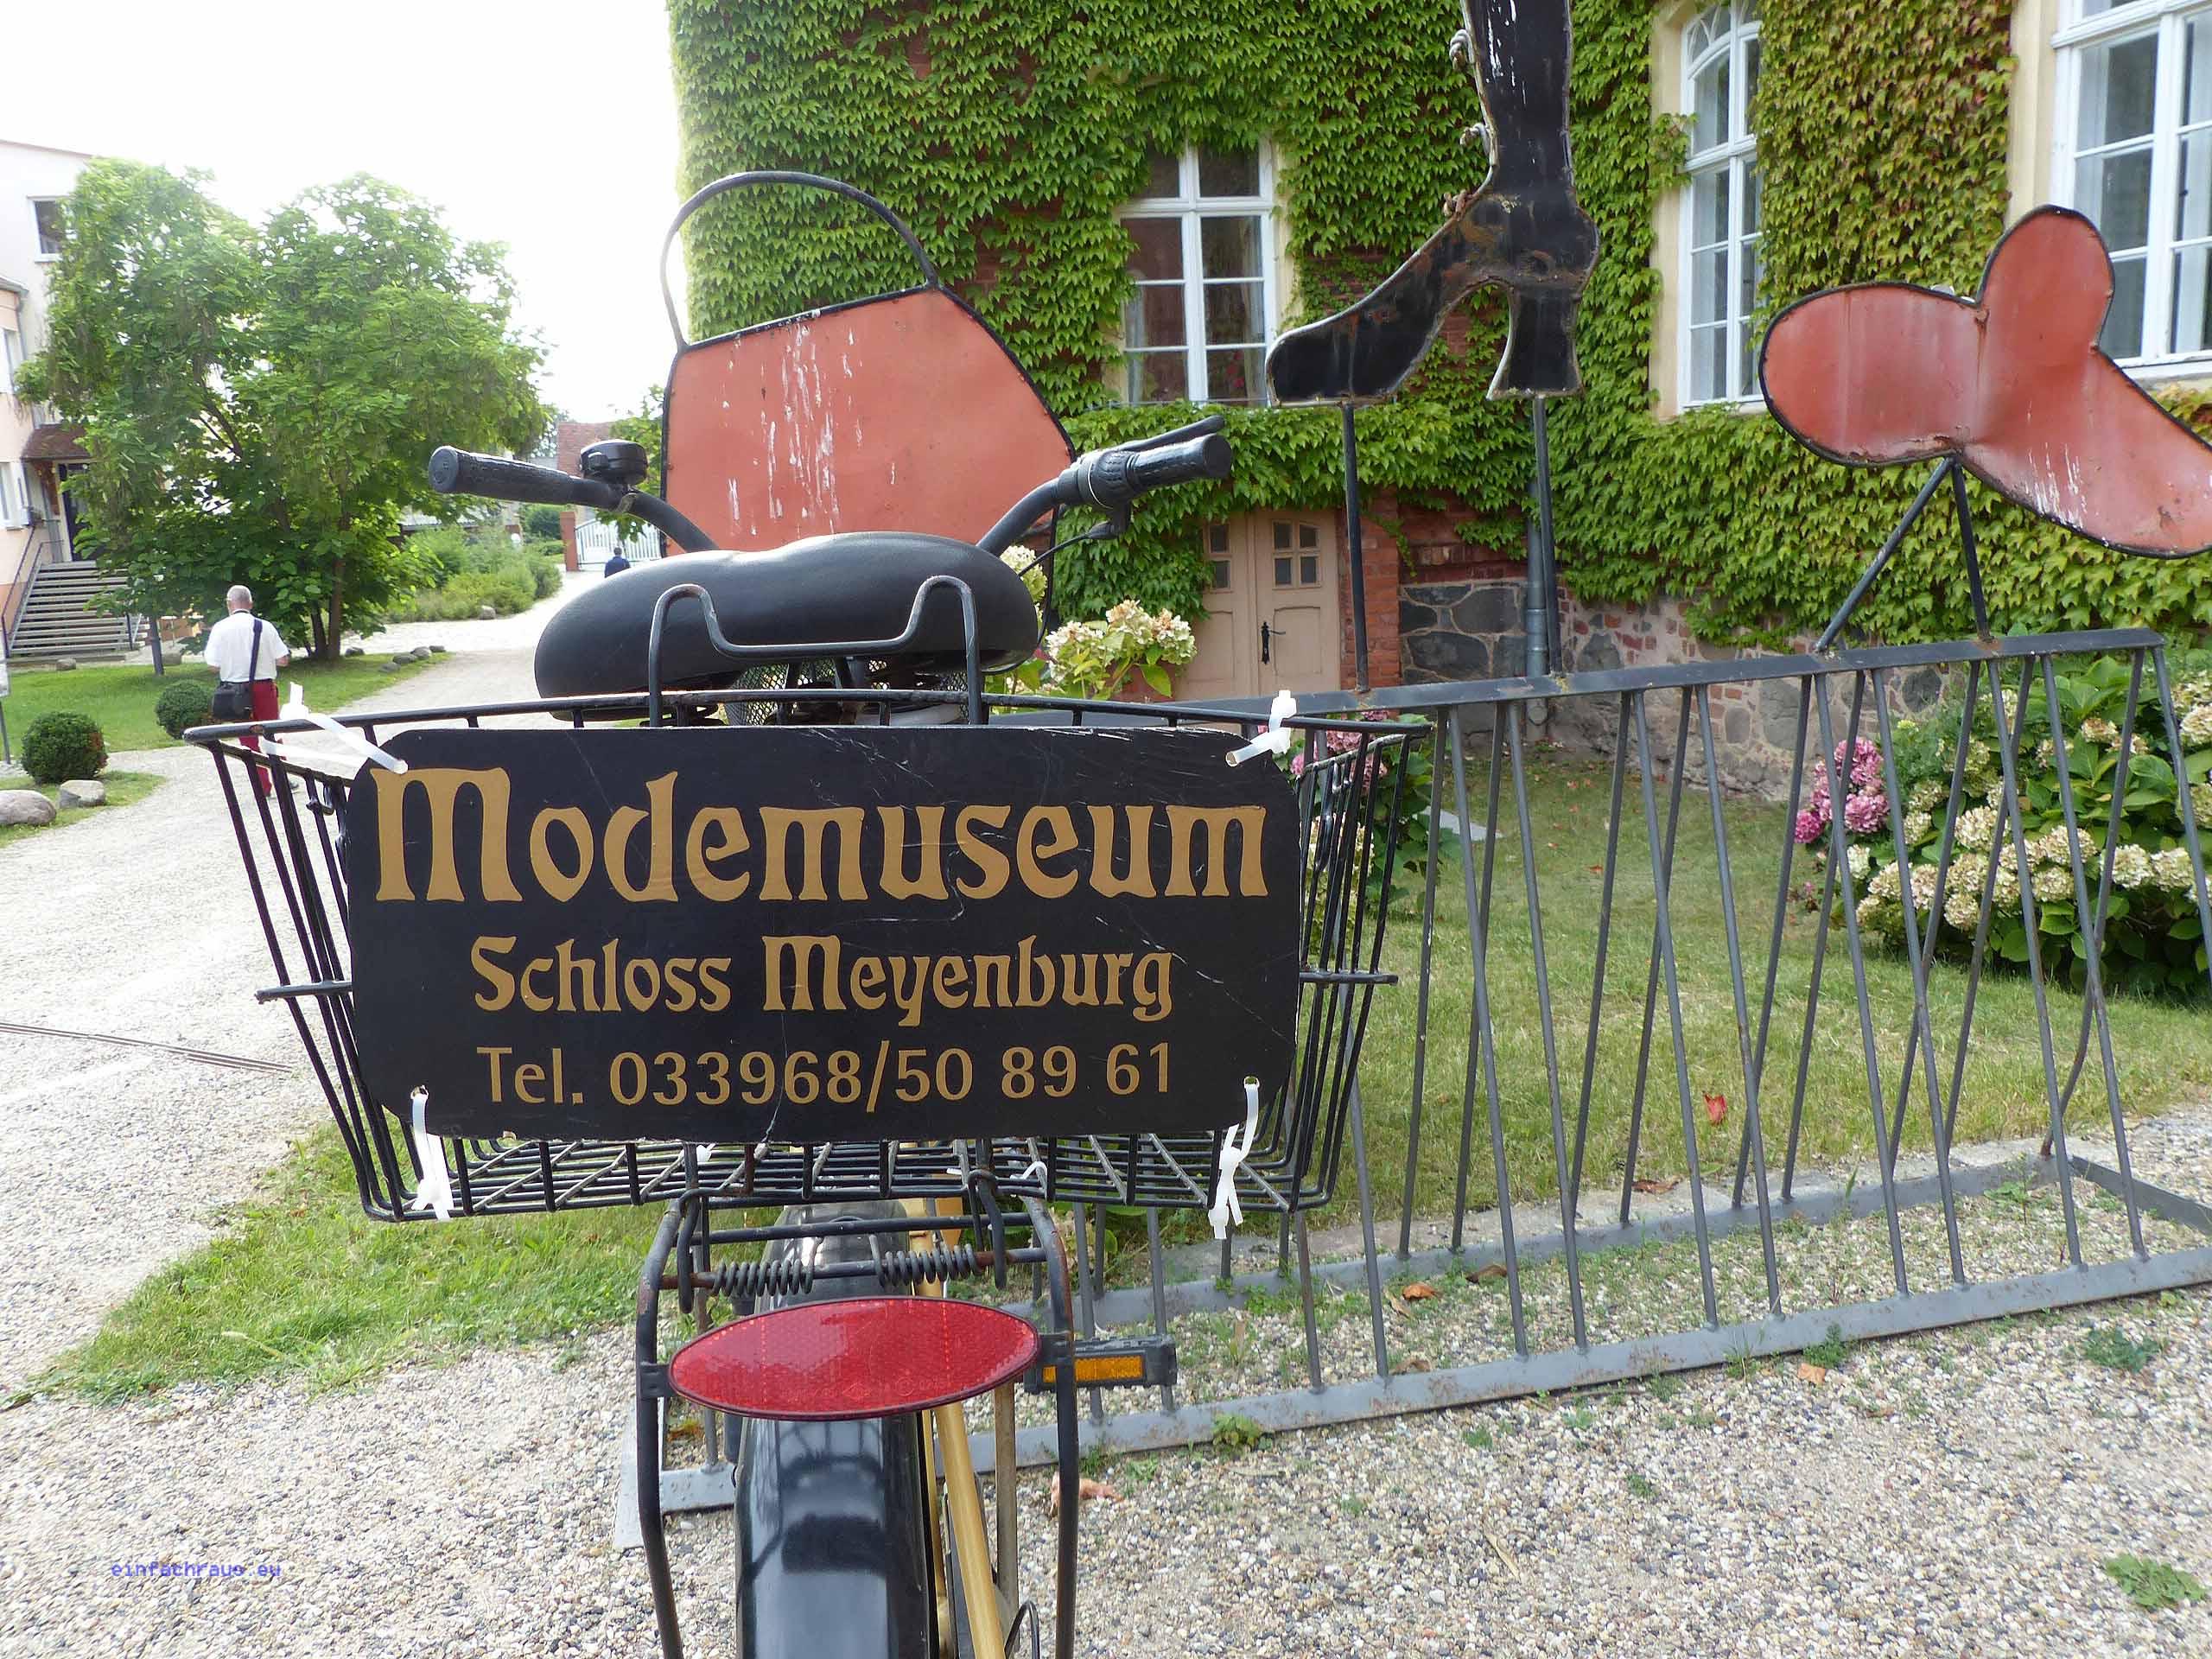 Modemuseum Meyenburg Foto: Weirauch